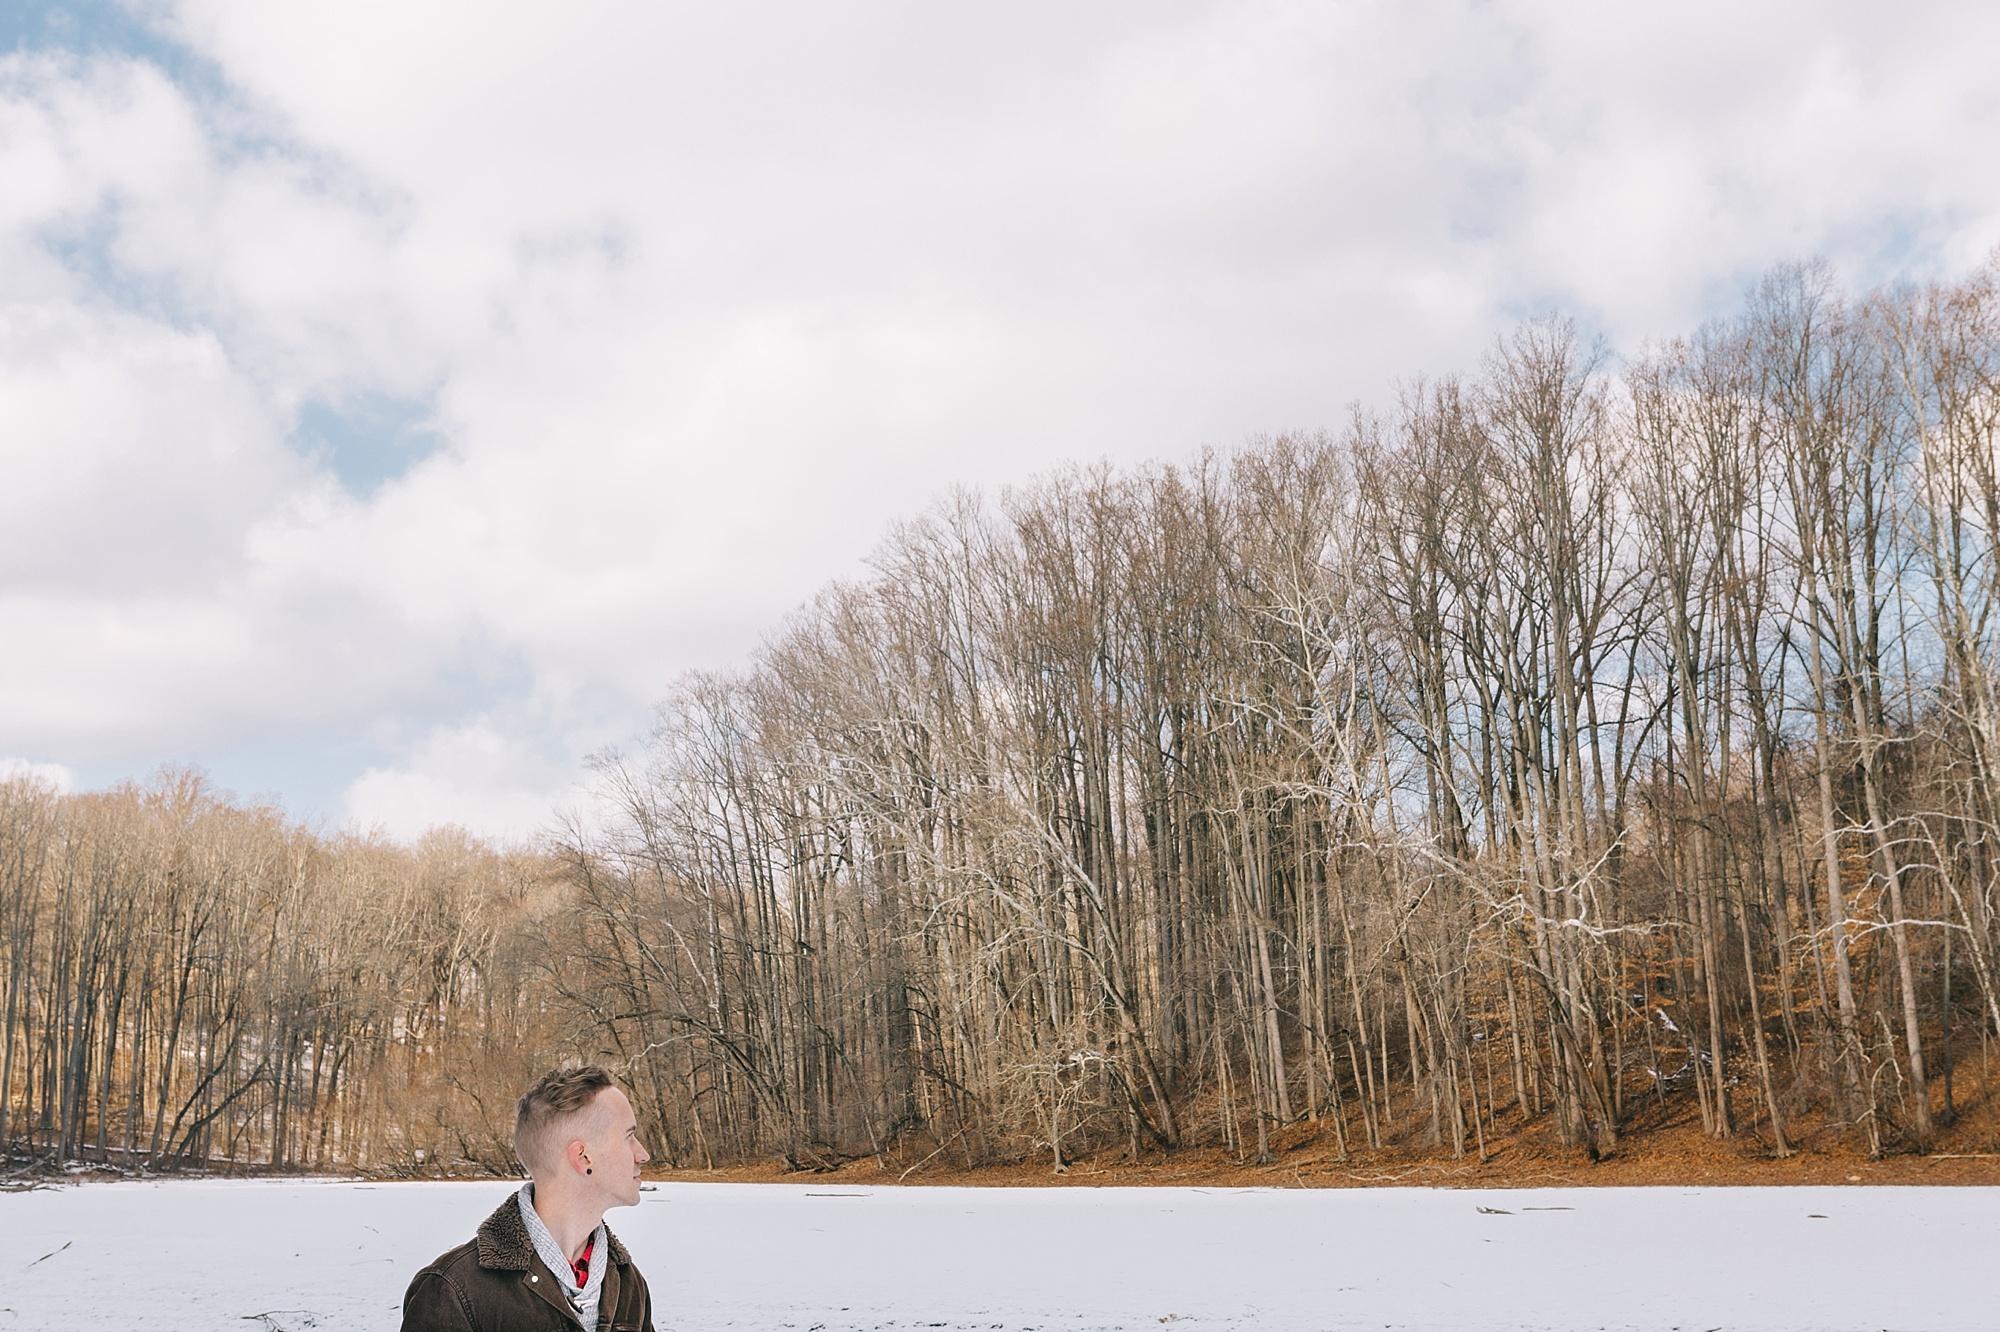 Joe_Mike_Gay_Couple_Photography_LGBT_Wedding_Landscape_0006.JPG